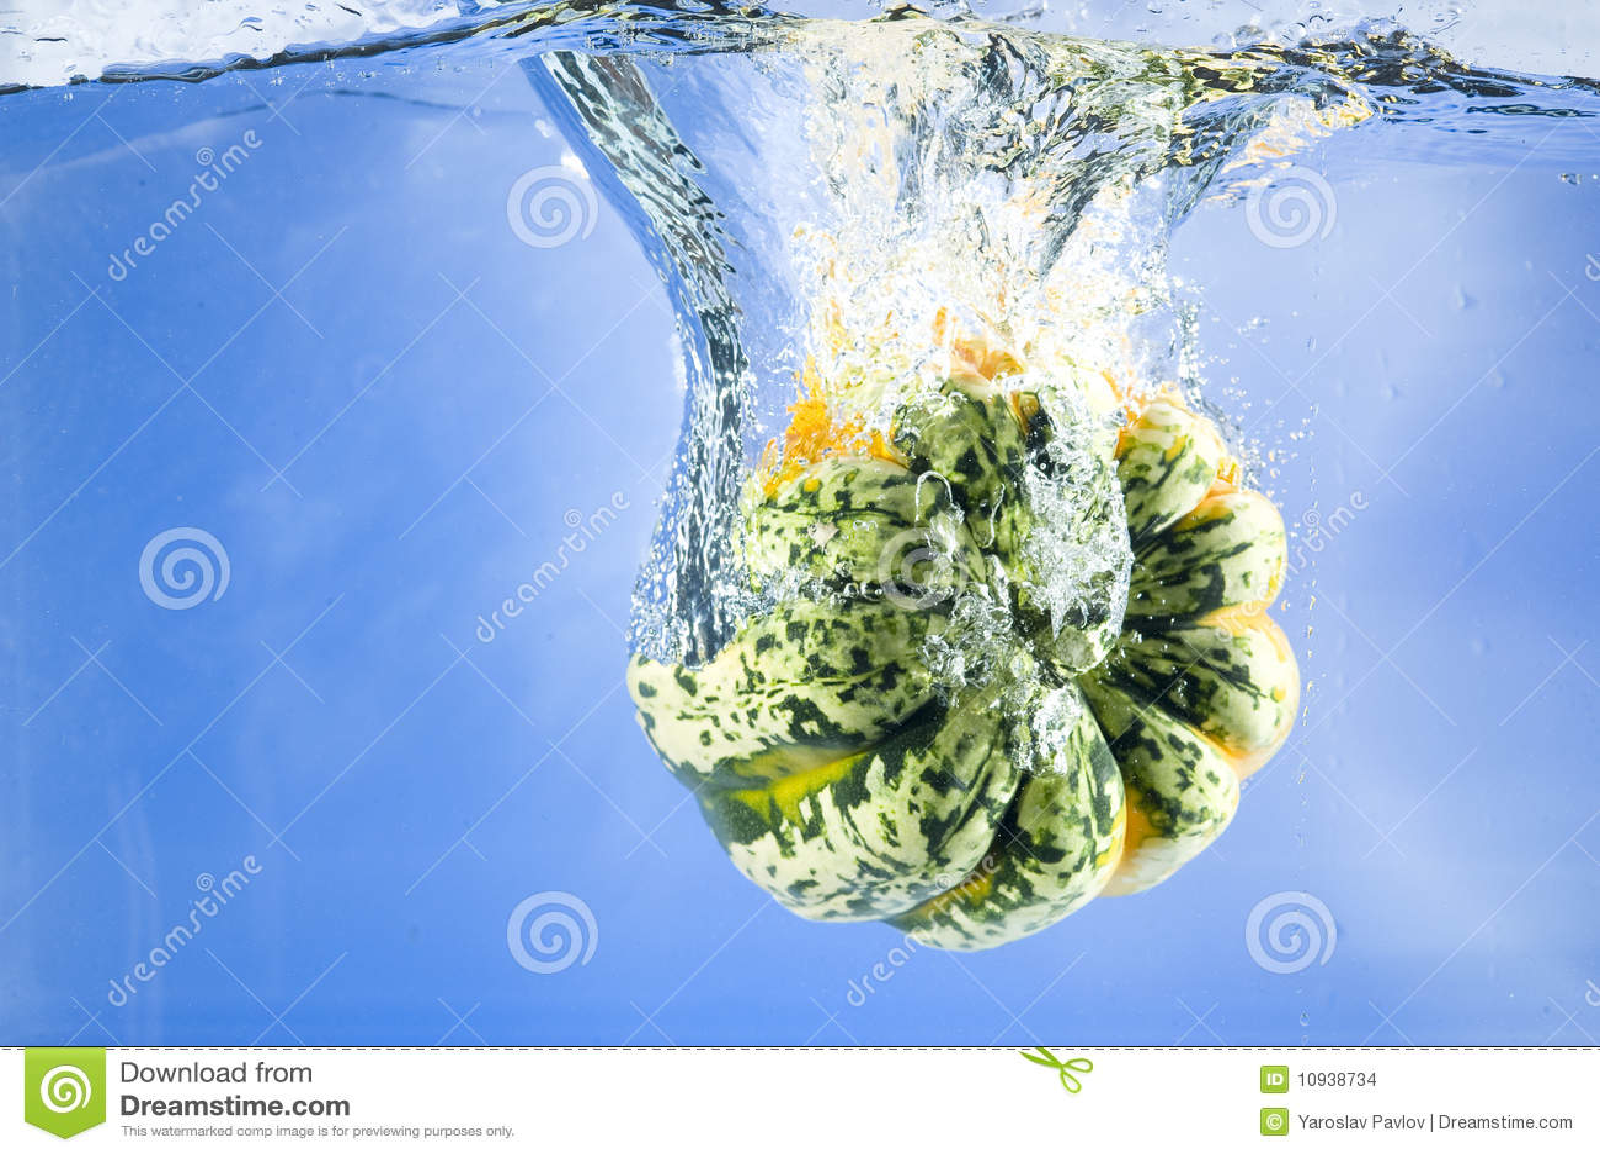 Тыква в воде